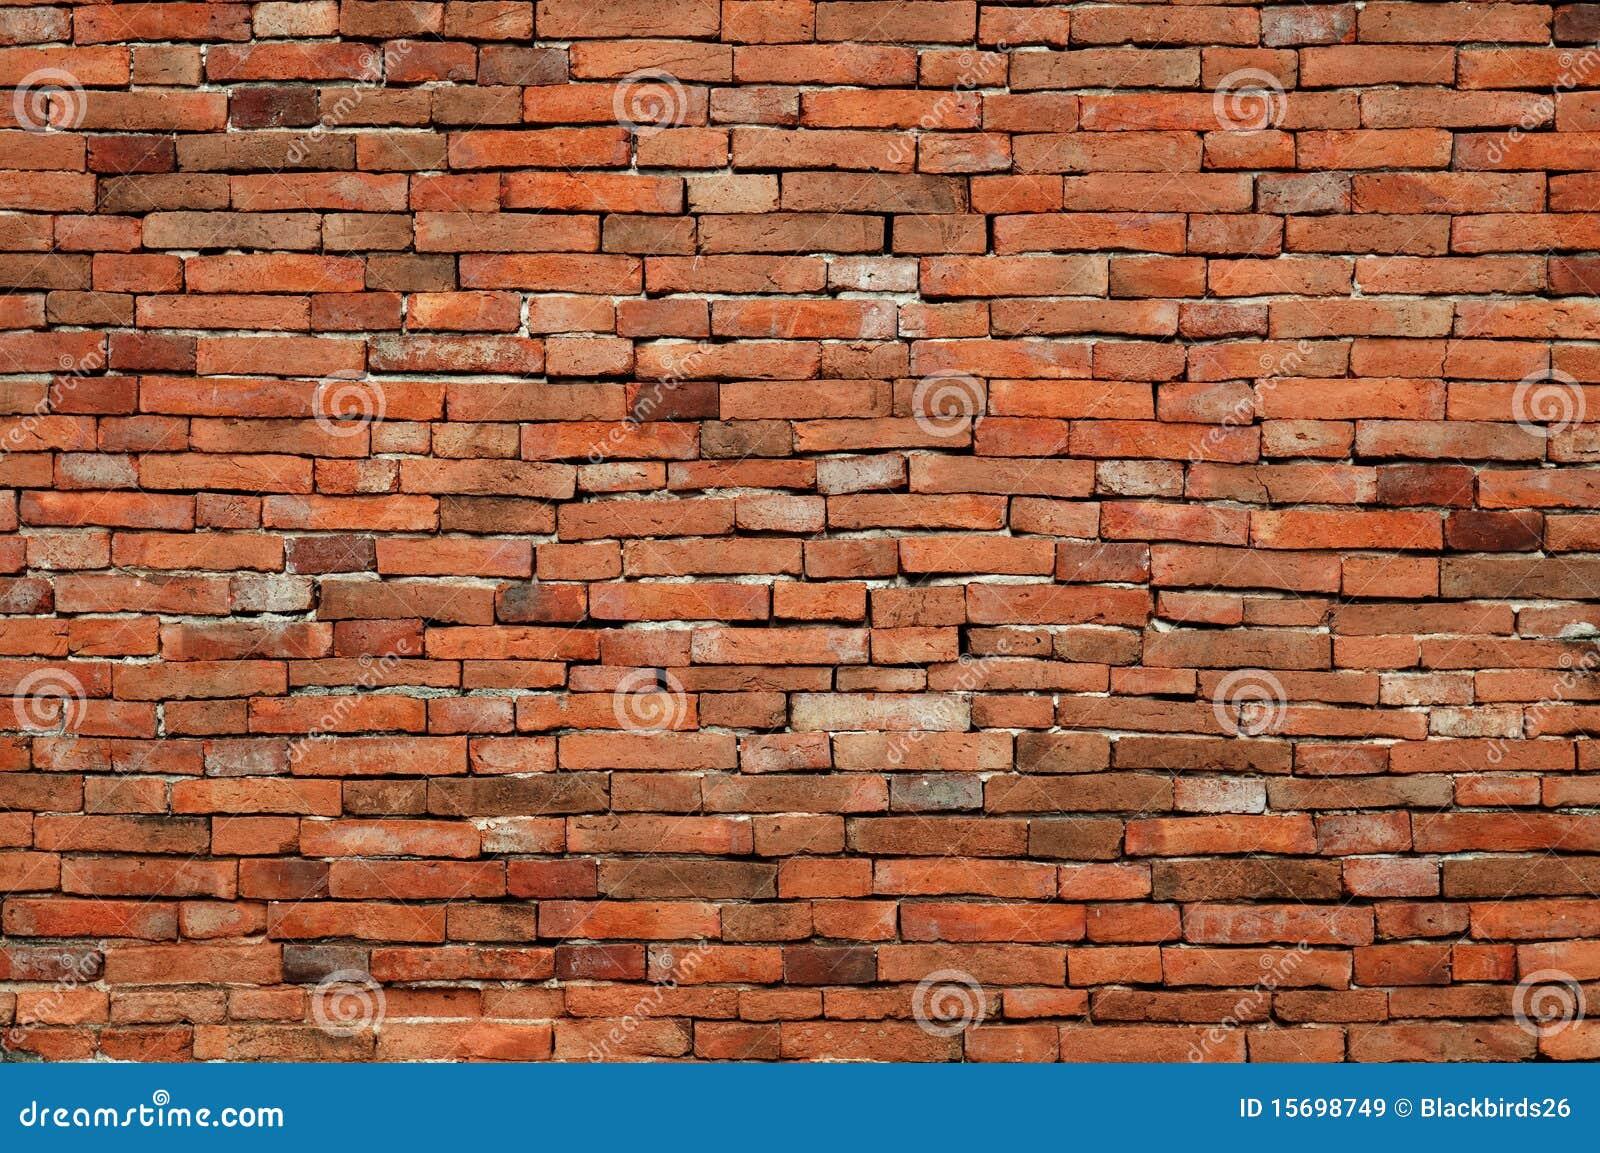 Old Brick Walls Royalty Free Stock Images Image 15698749